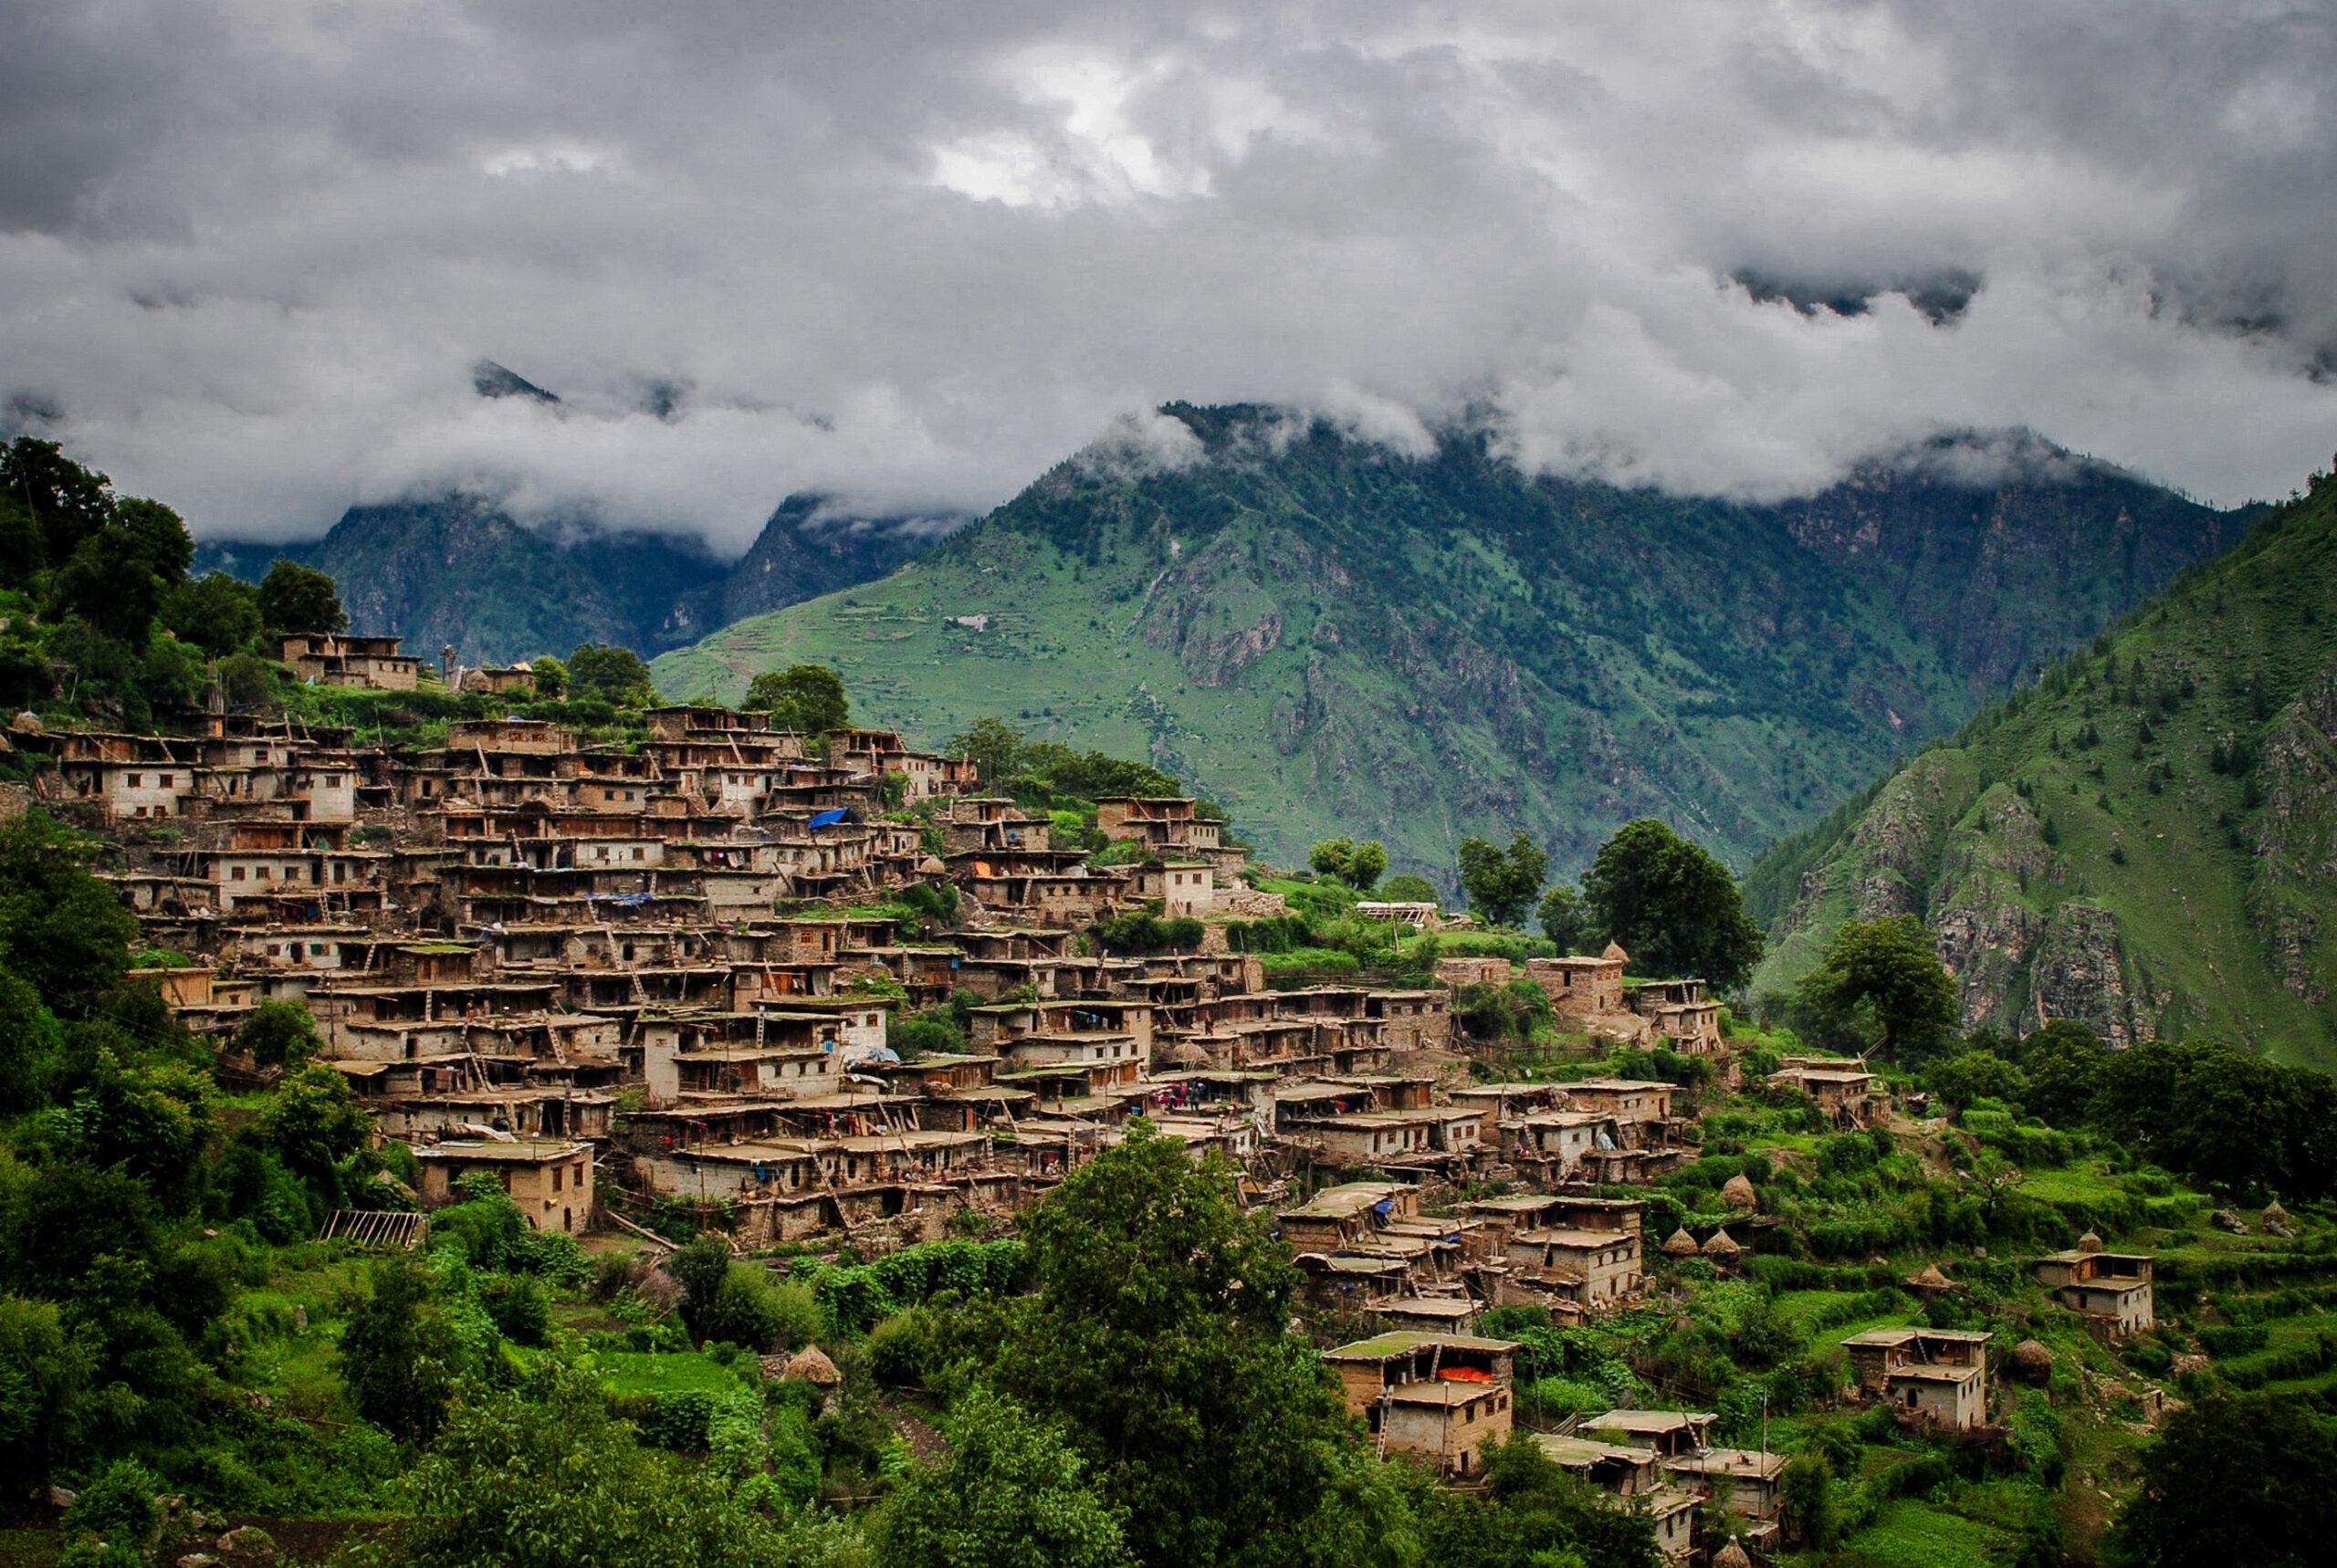 Despite local authorities' complaints, Kathmandu denies China had encroached on its territory